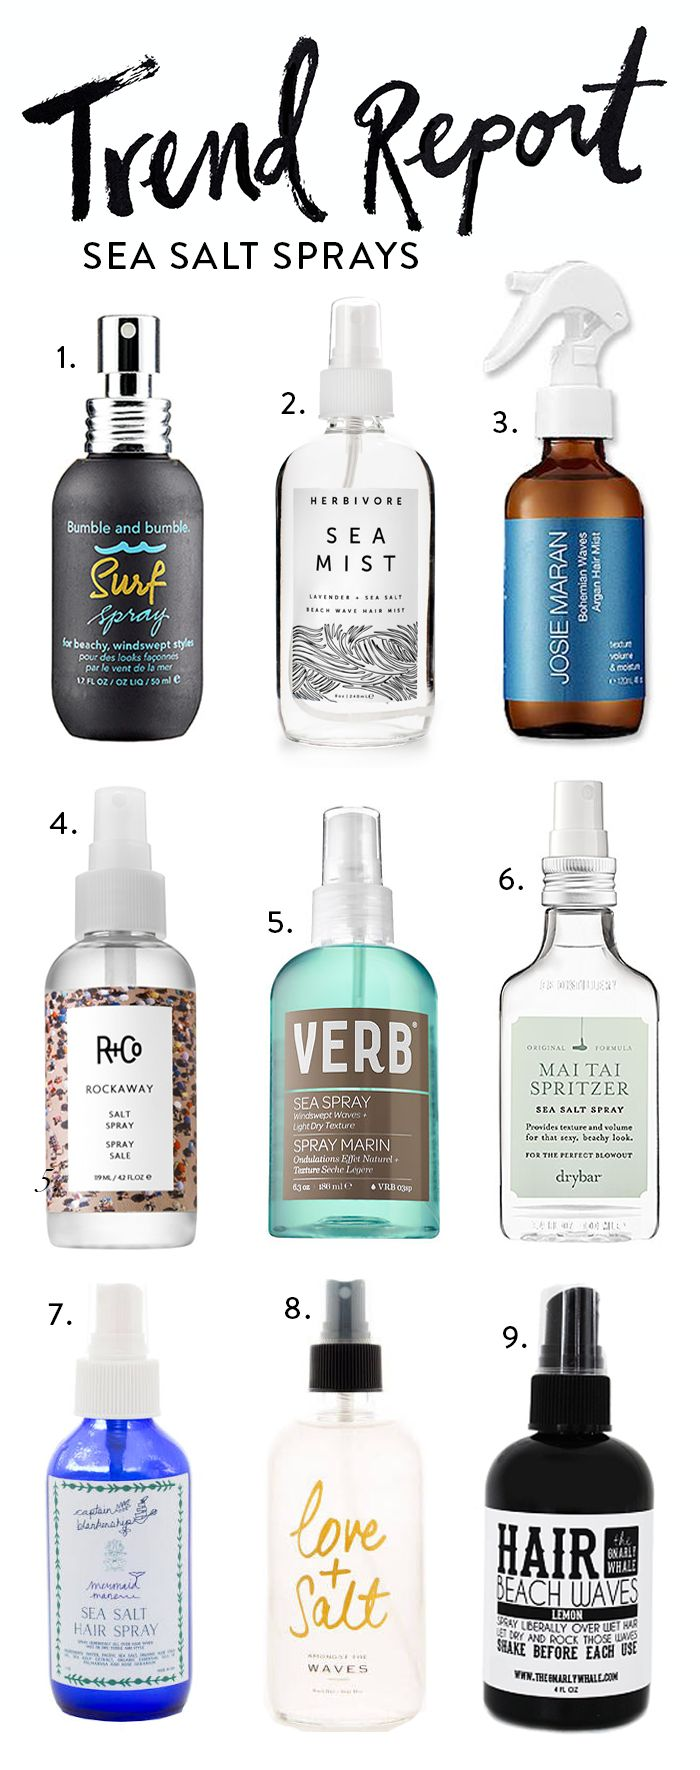 Trend Report - Sea Salt Sprays | Beauty Bets